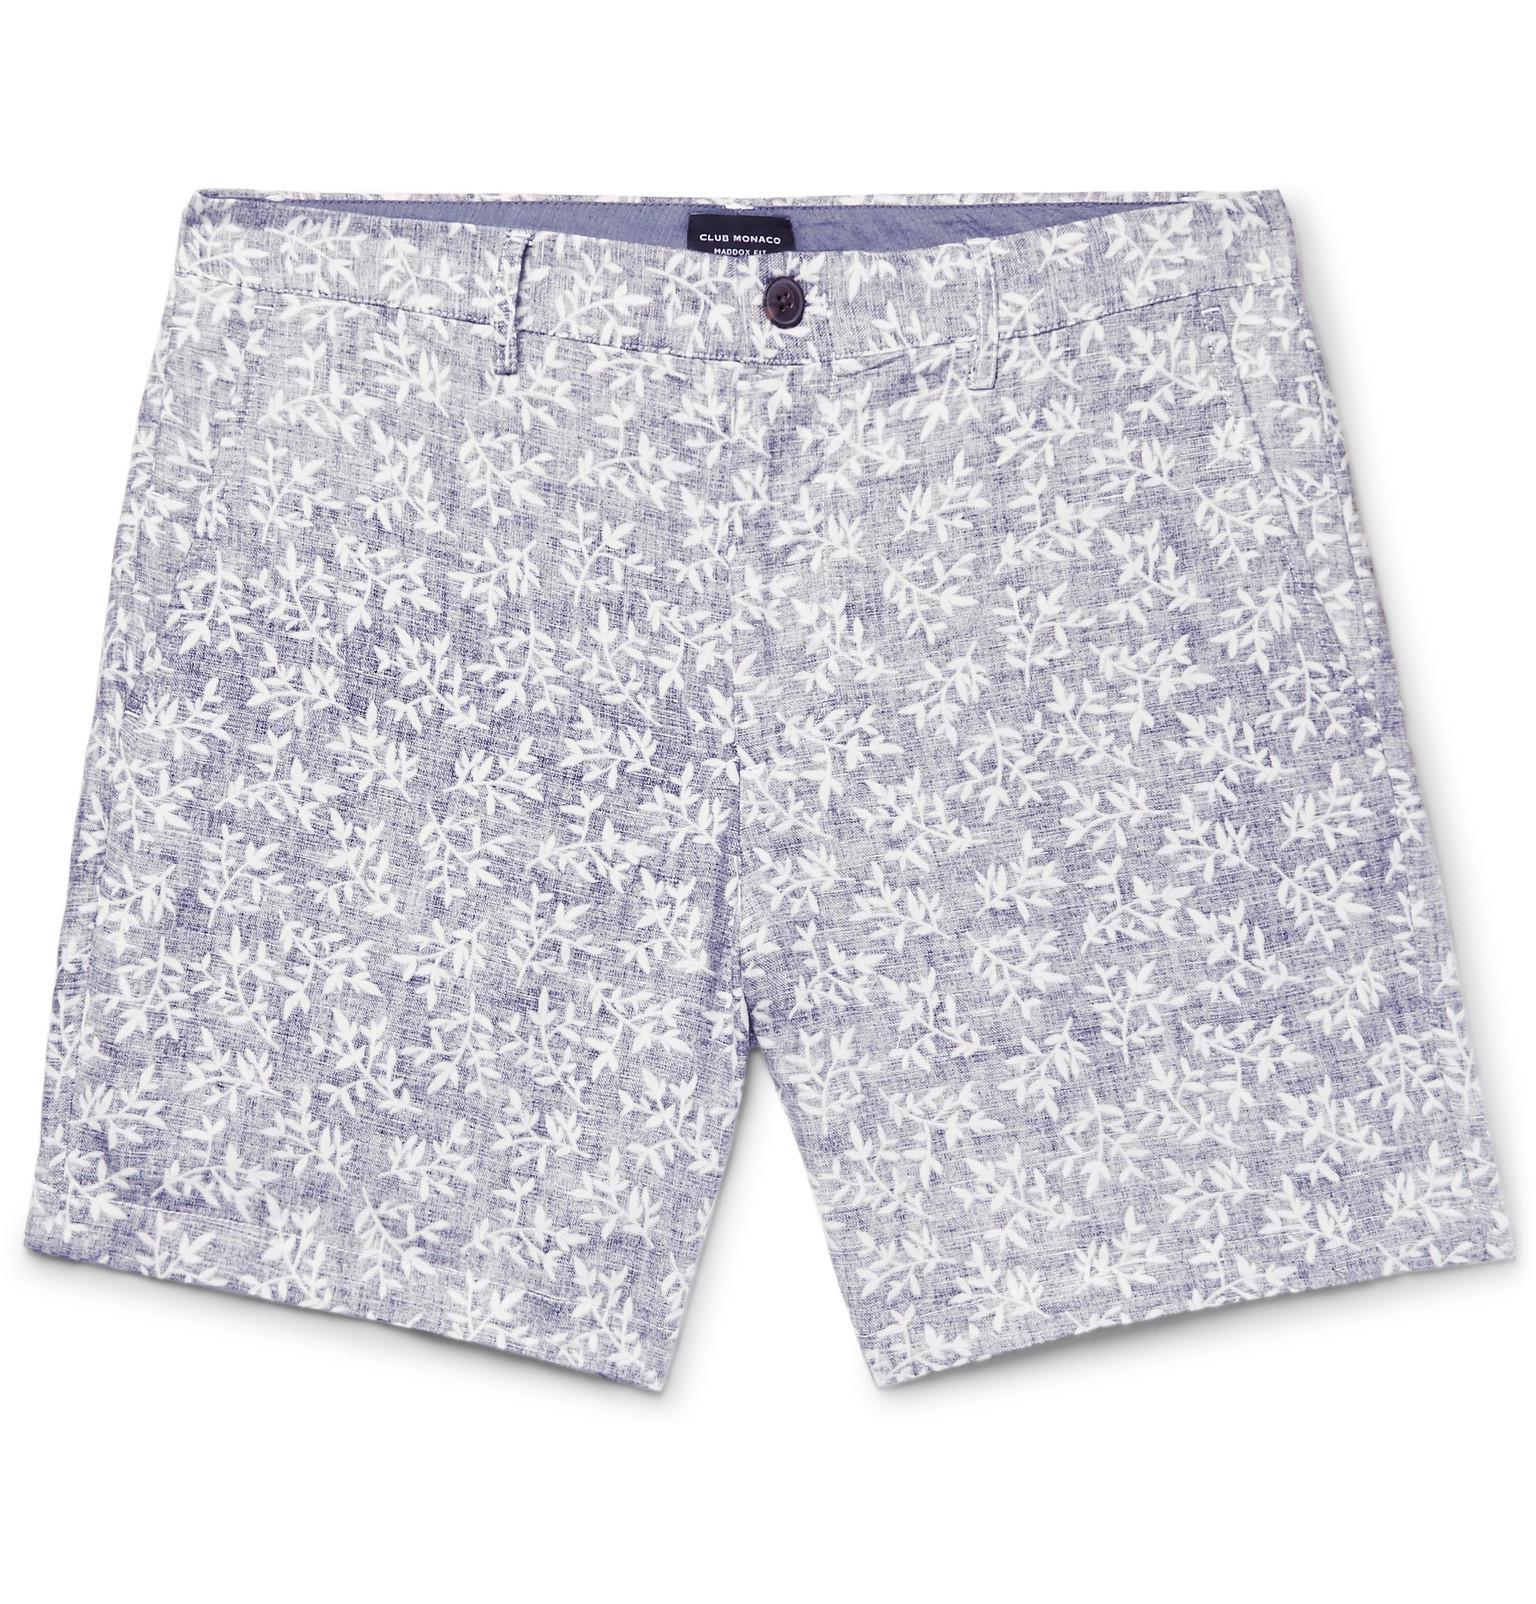 Baxter Slim-fit Stretch Linen And Cotton-blend Shorts Club Monaco rLz16ZU